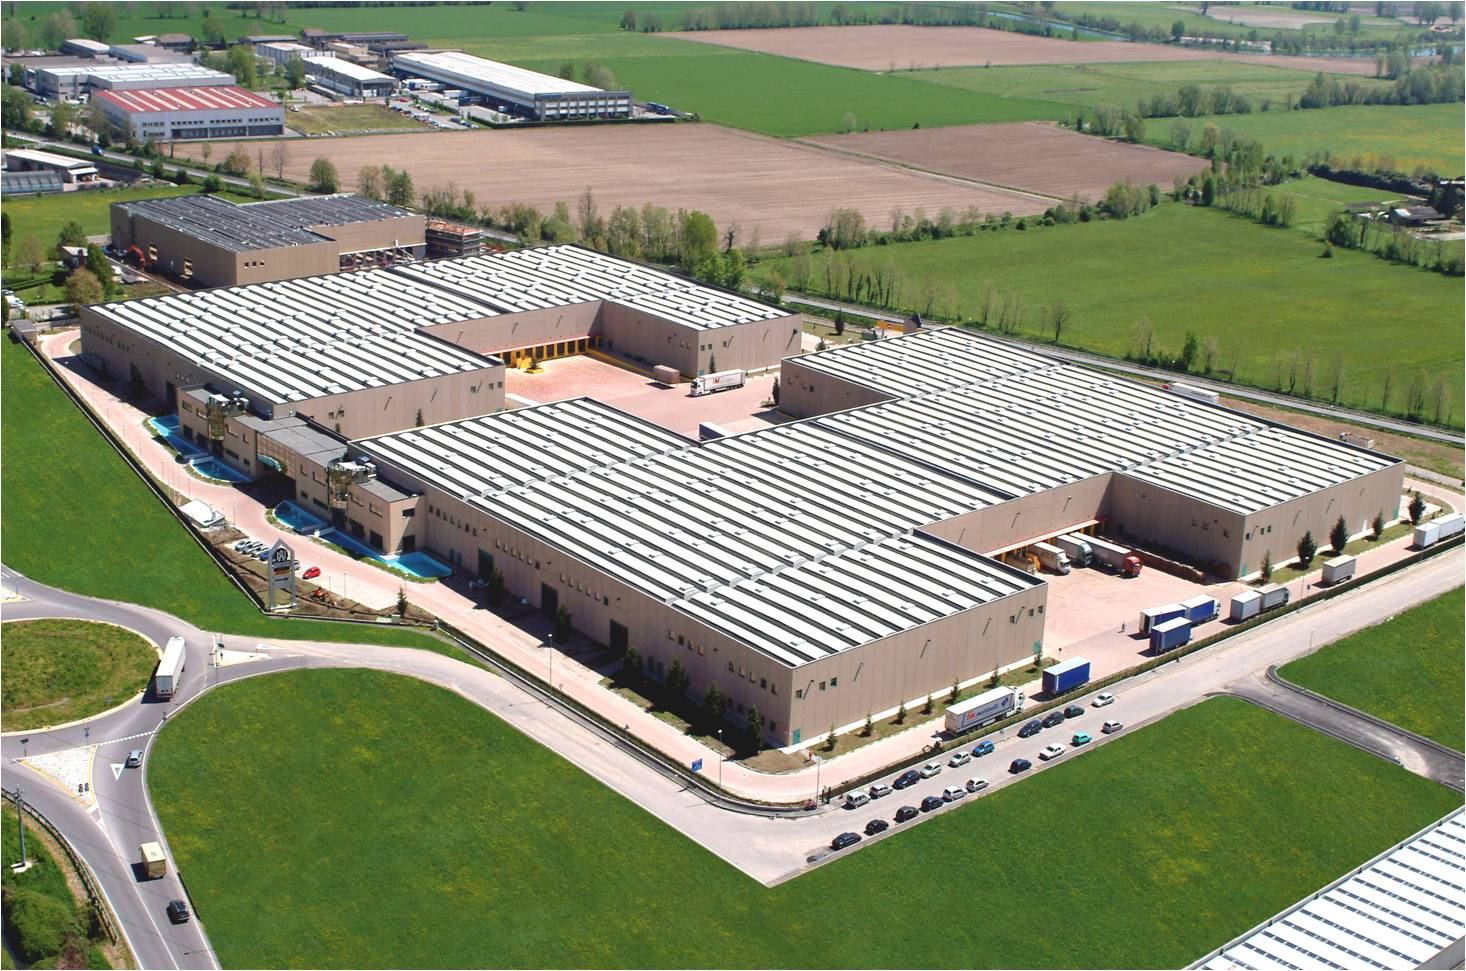 Hale industriale cu elemente structurale prefabricate din beton armat - Sediu Magnetti Building MAGNETTI - Poza 1